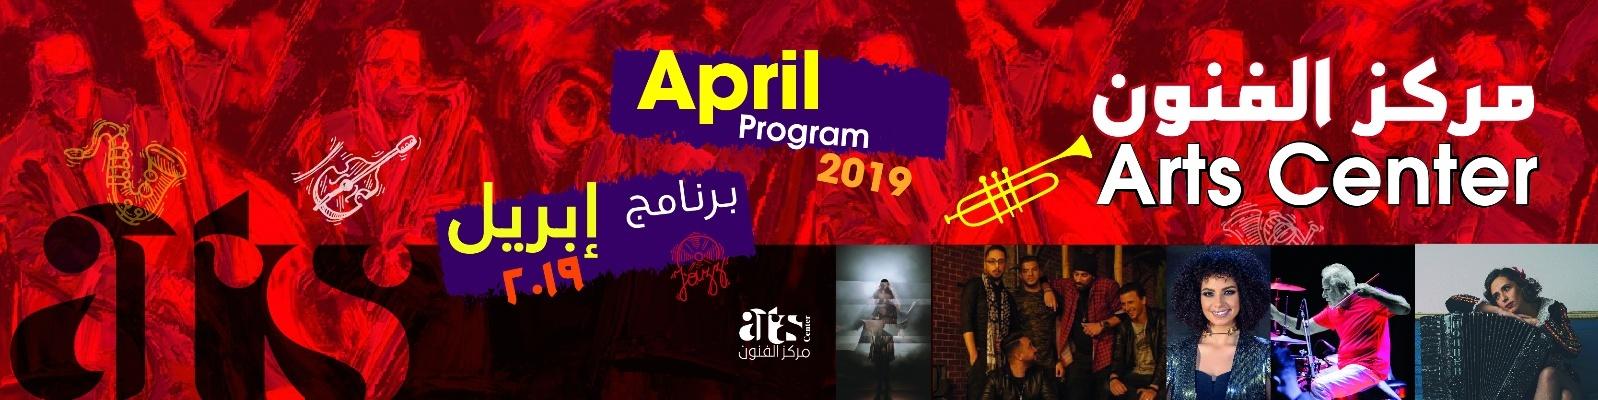 Arts Center's April Program